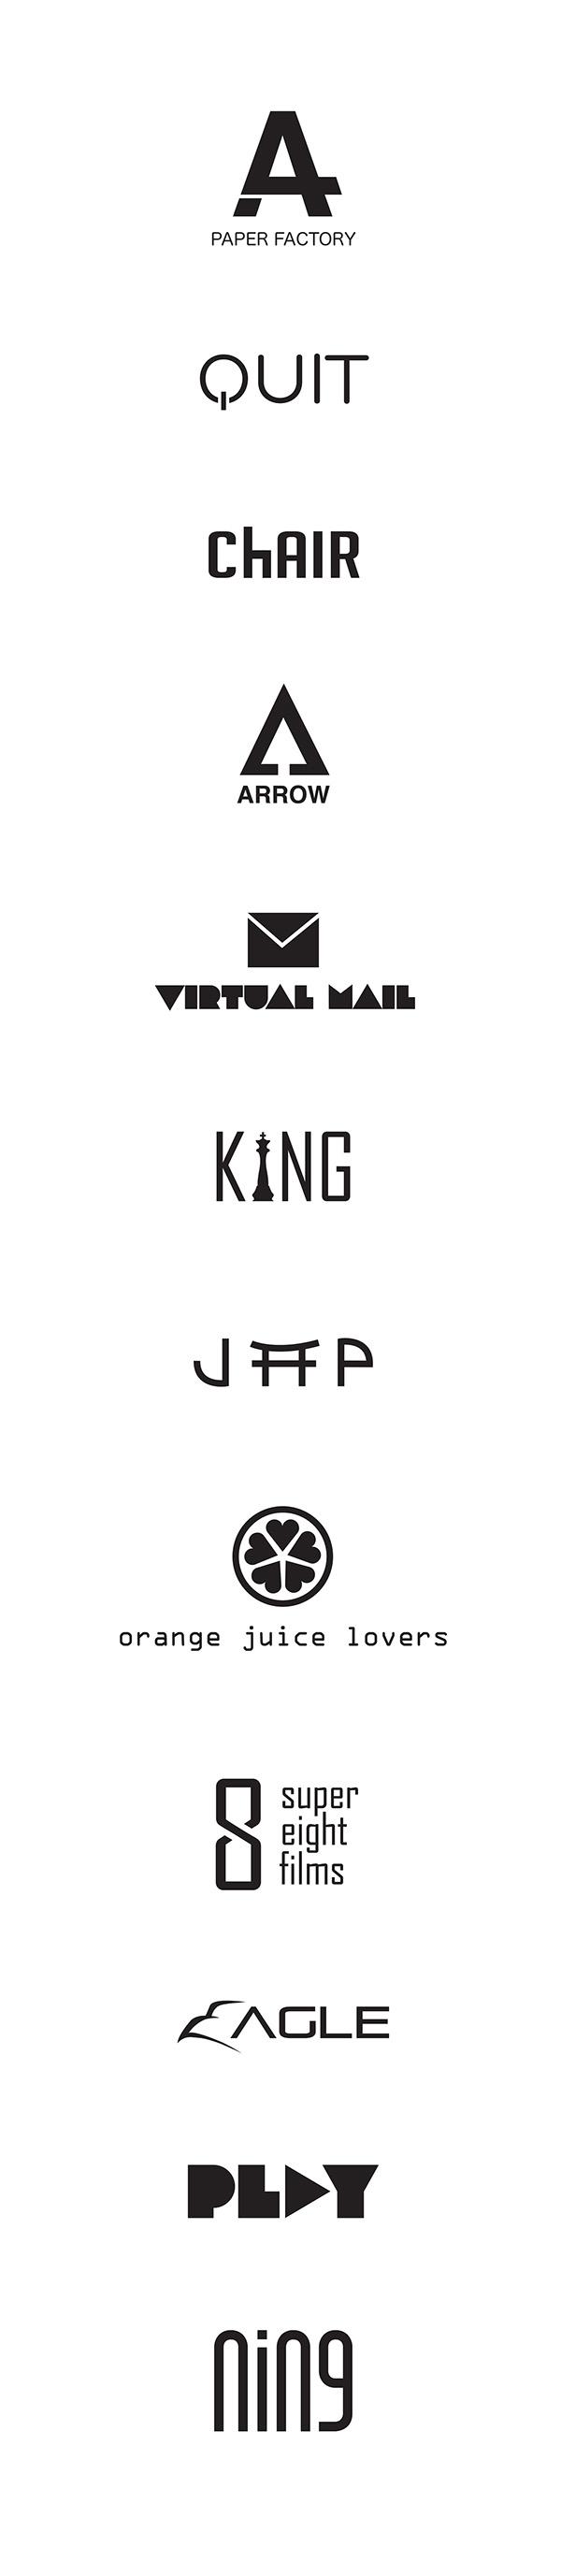 logo New logo logos logofolio new identity brand